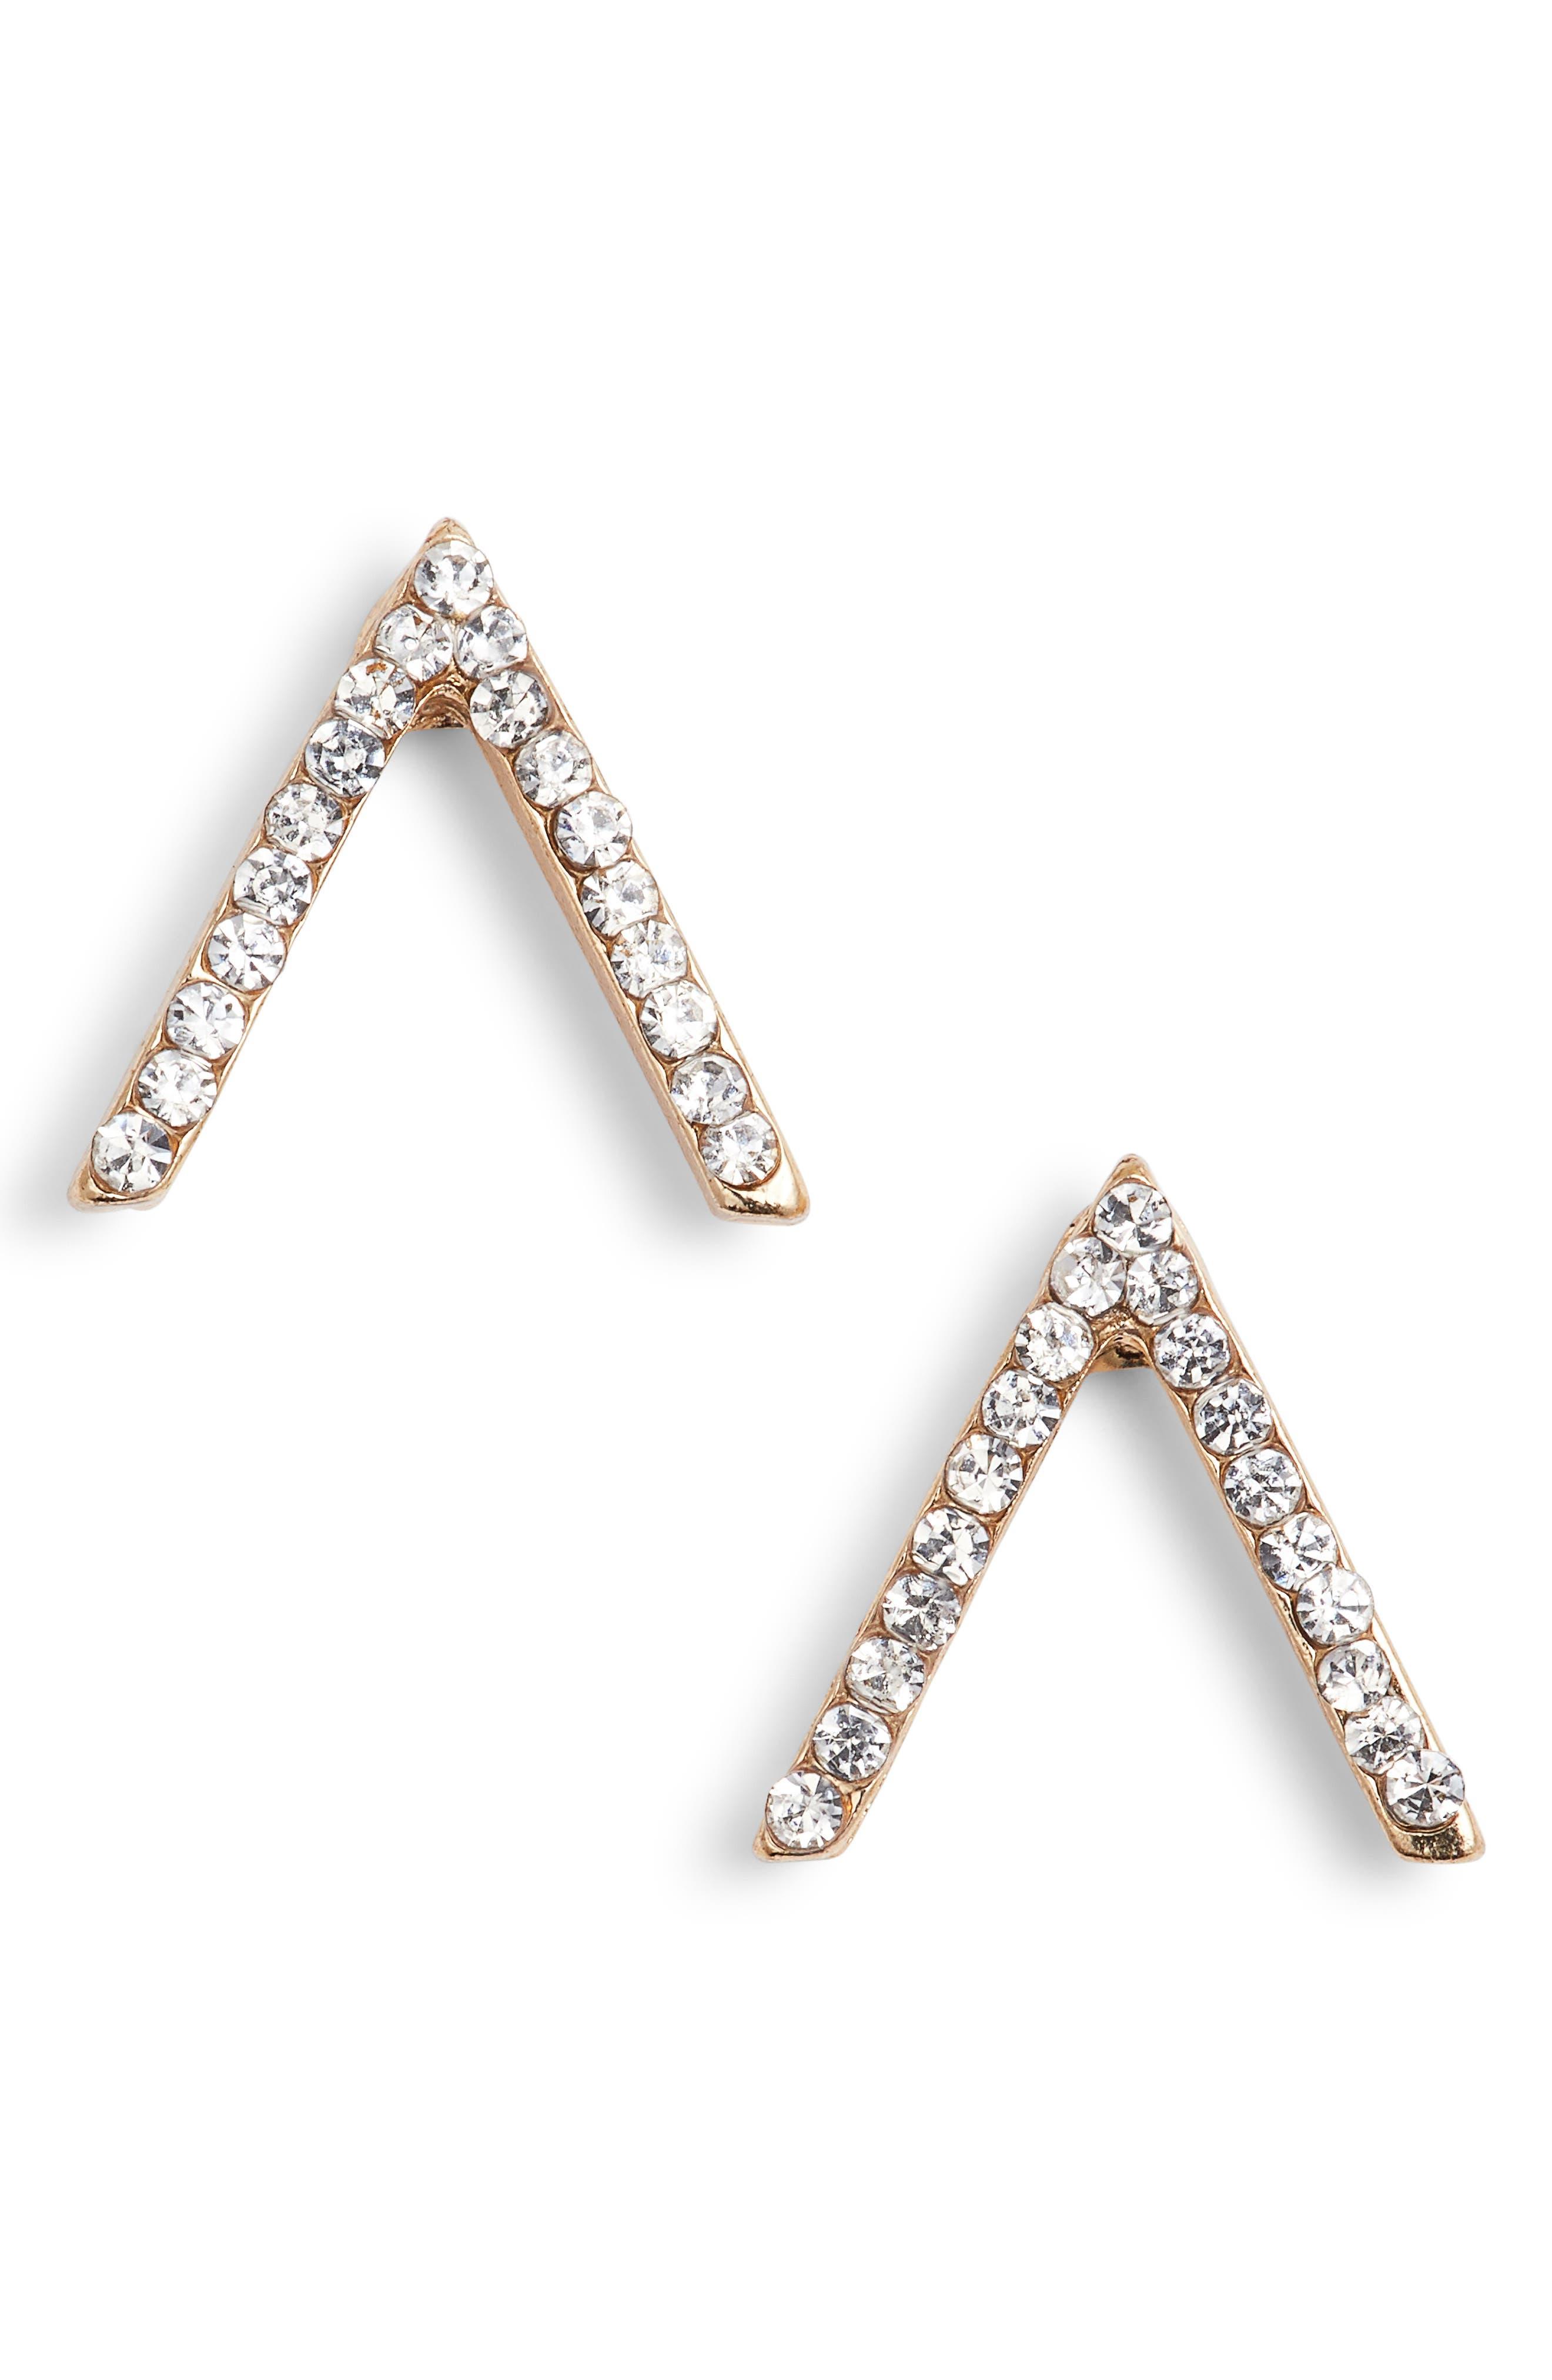 UNCOMMON JAMES BY KRISTIN CAVALLARI Little Stud Crystal Chevron Stud Earrings, Main, color, GOLD